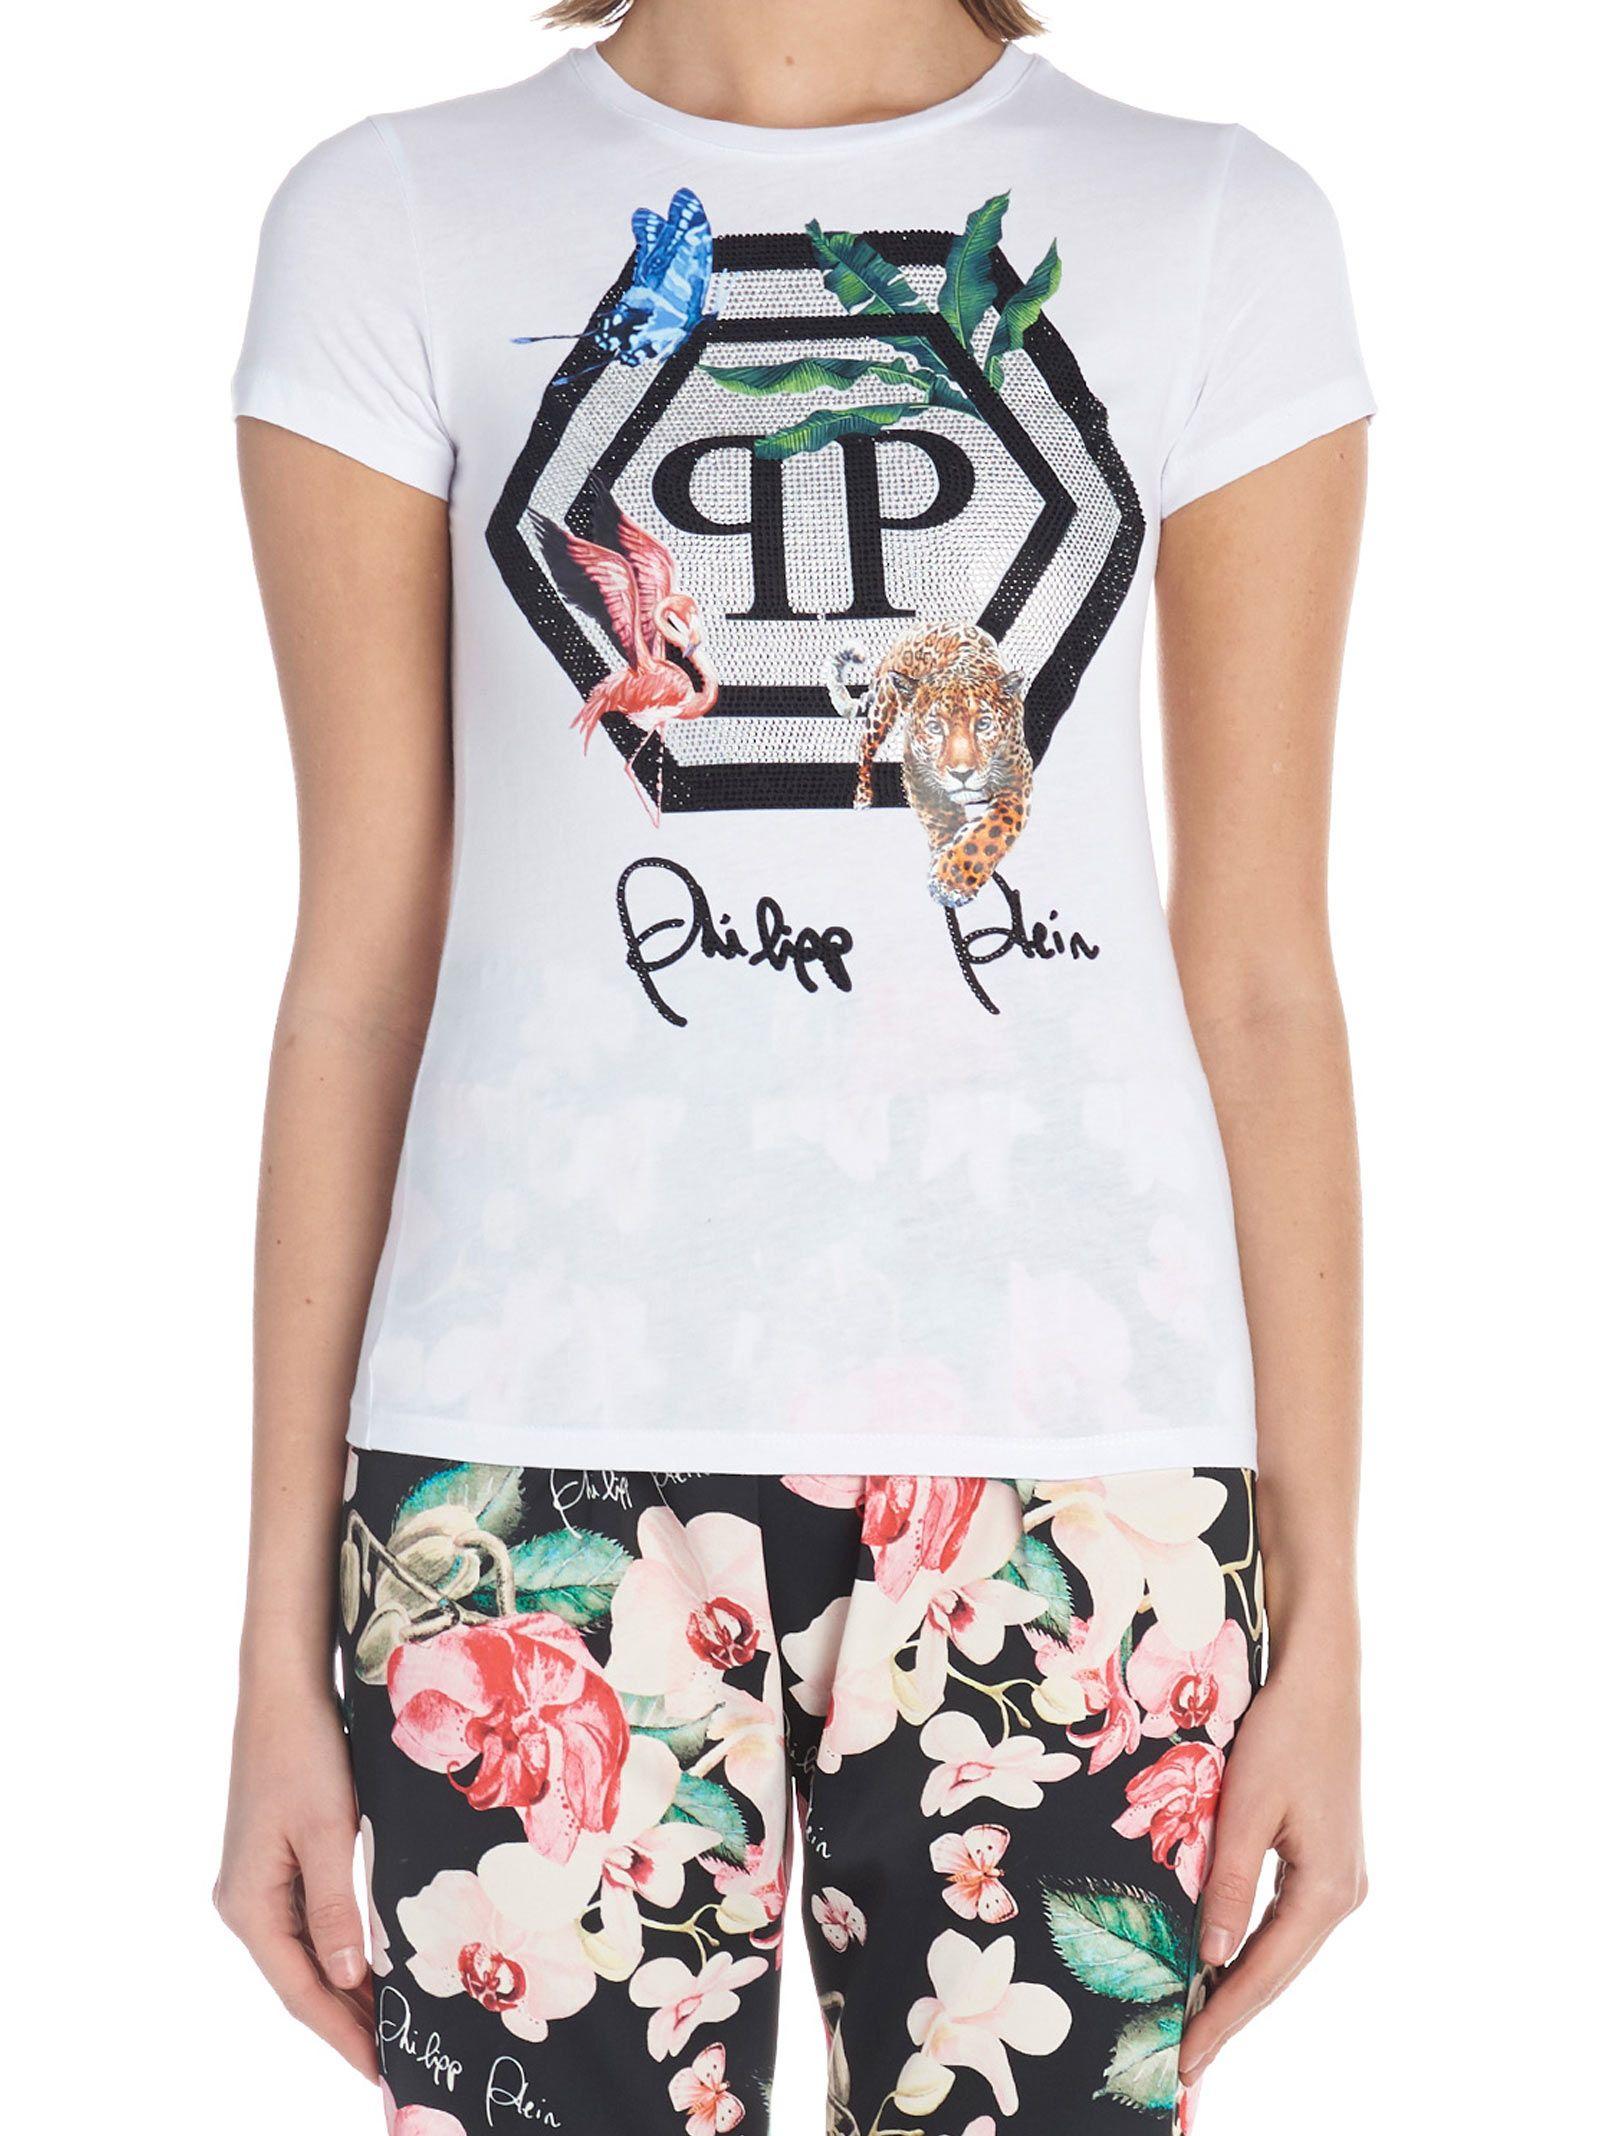 Philipp Plein 'jungle' T-shirt